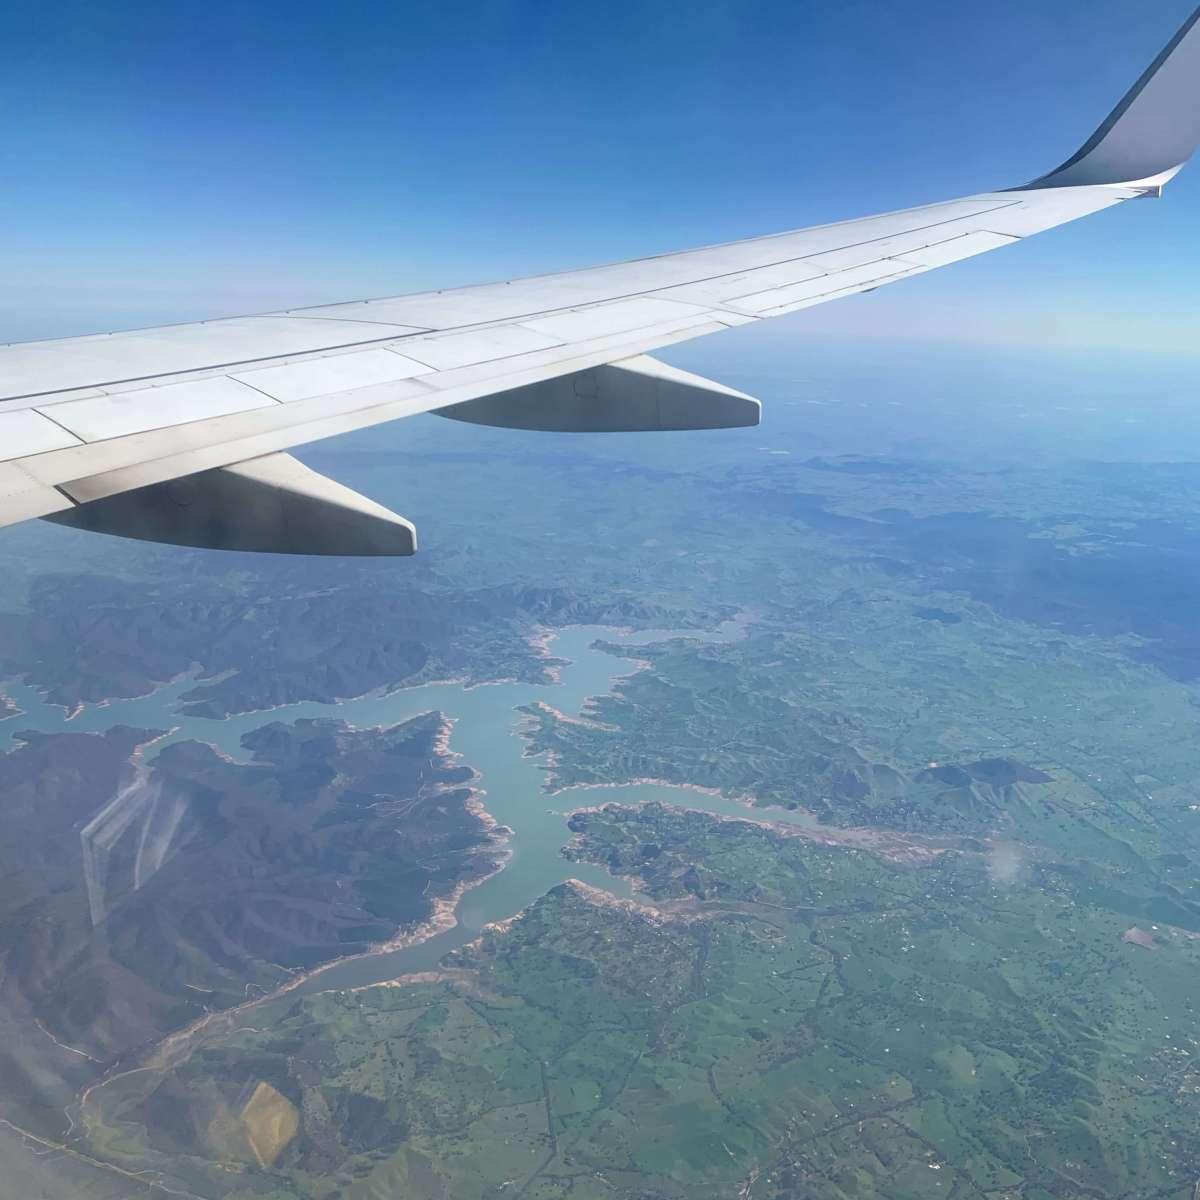 Somewhere over Auckland, New Zealand